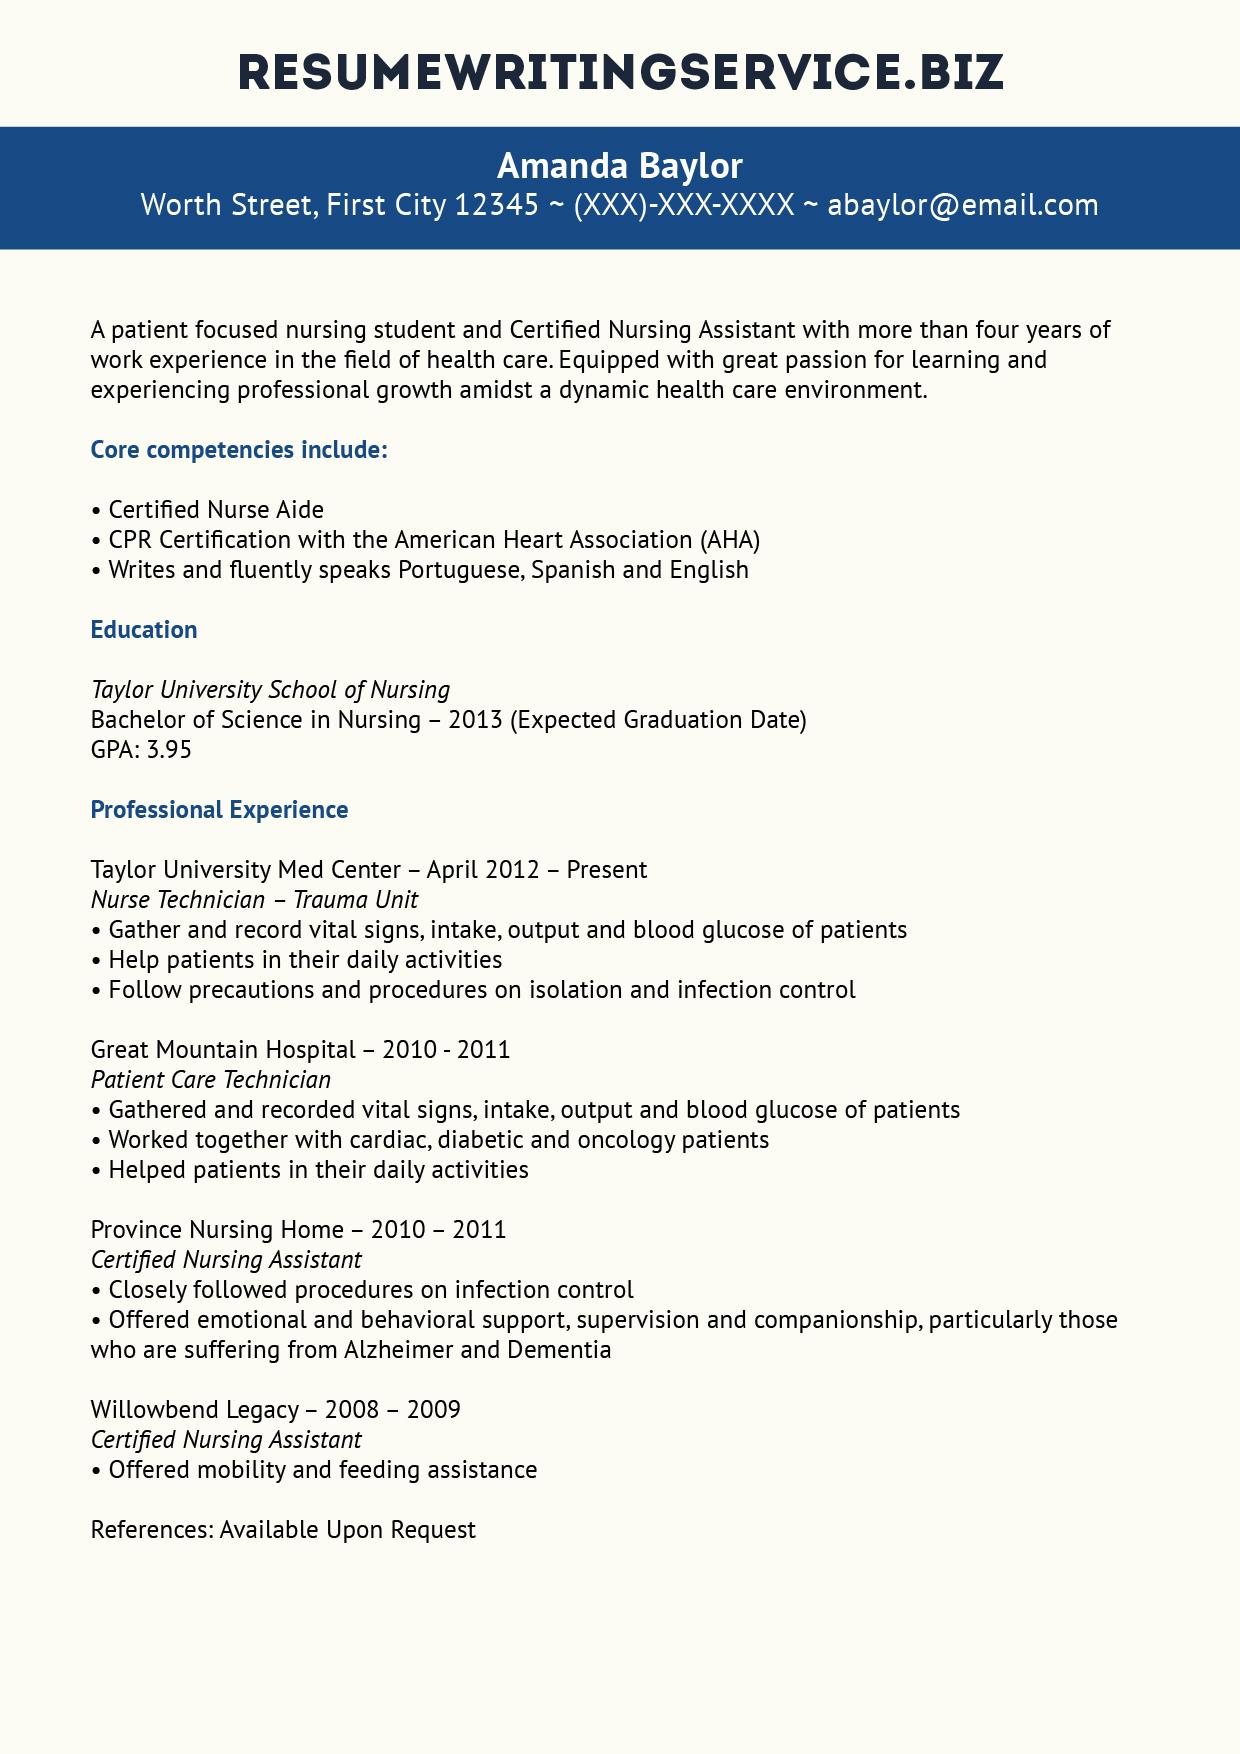 New Grad RN Resume Nurse Resume Service Certified Award Winning Writing  Excellence